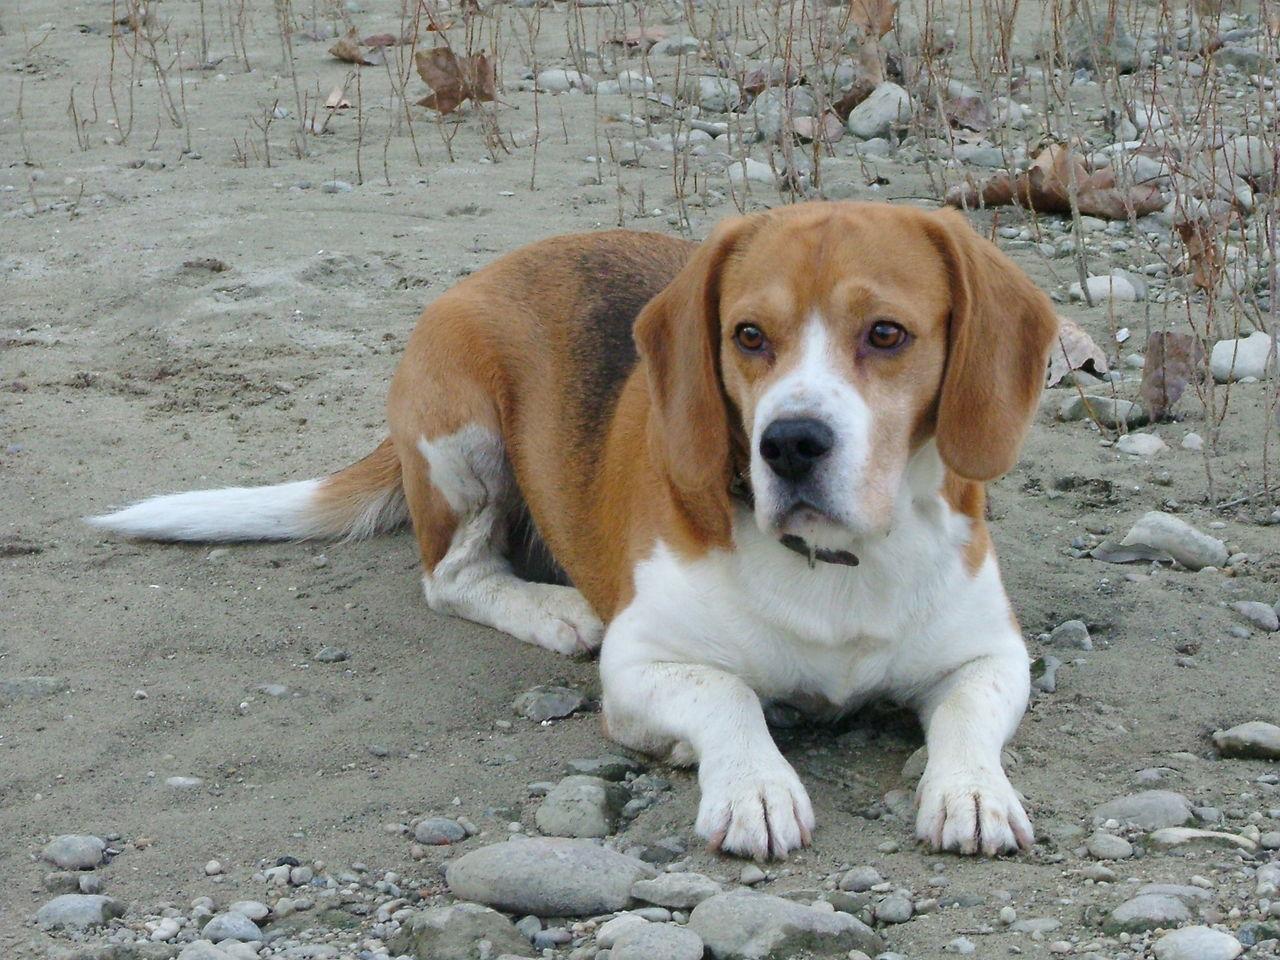 Betyár Beagle Beaglelove Beaglelovers Beagles  Betyár Doglover Doglovers Dogs Dogs Of EyeEm Dogslife Hunter Kutyasetaltatas My Puppy Puppy Puppy Love PuppyLove Raskal